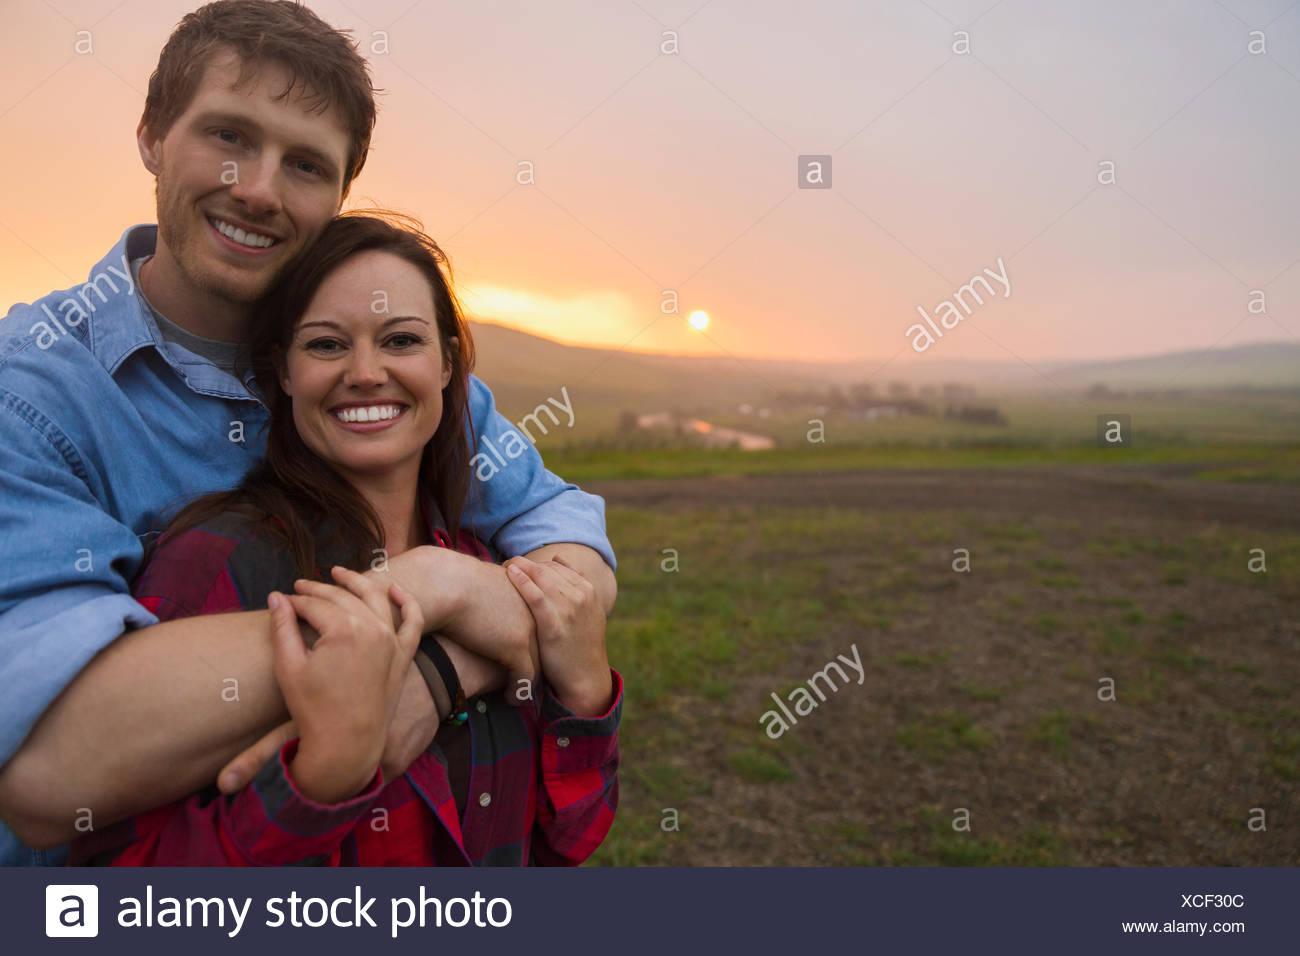 Porträt von paar umarmt im Feld bei Sonnenuntergang Stockbild